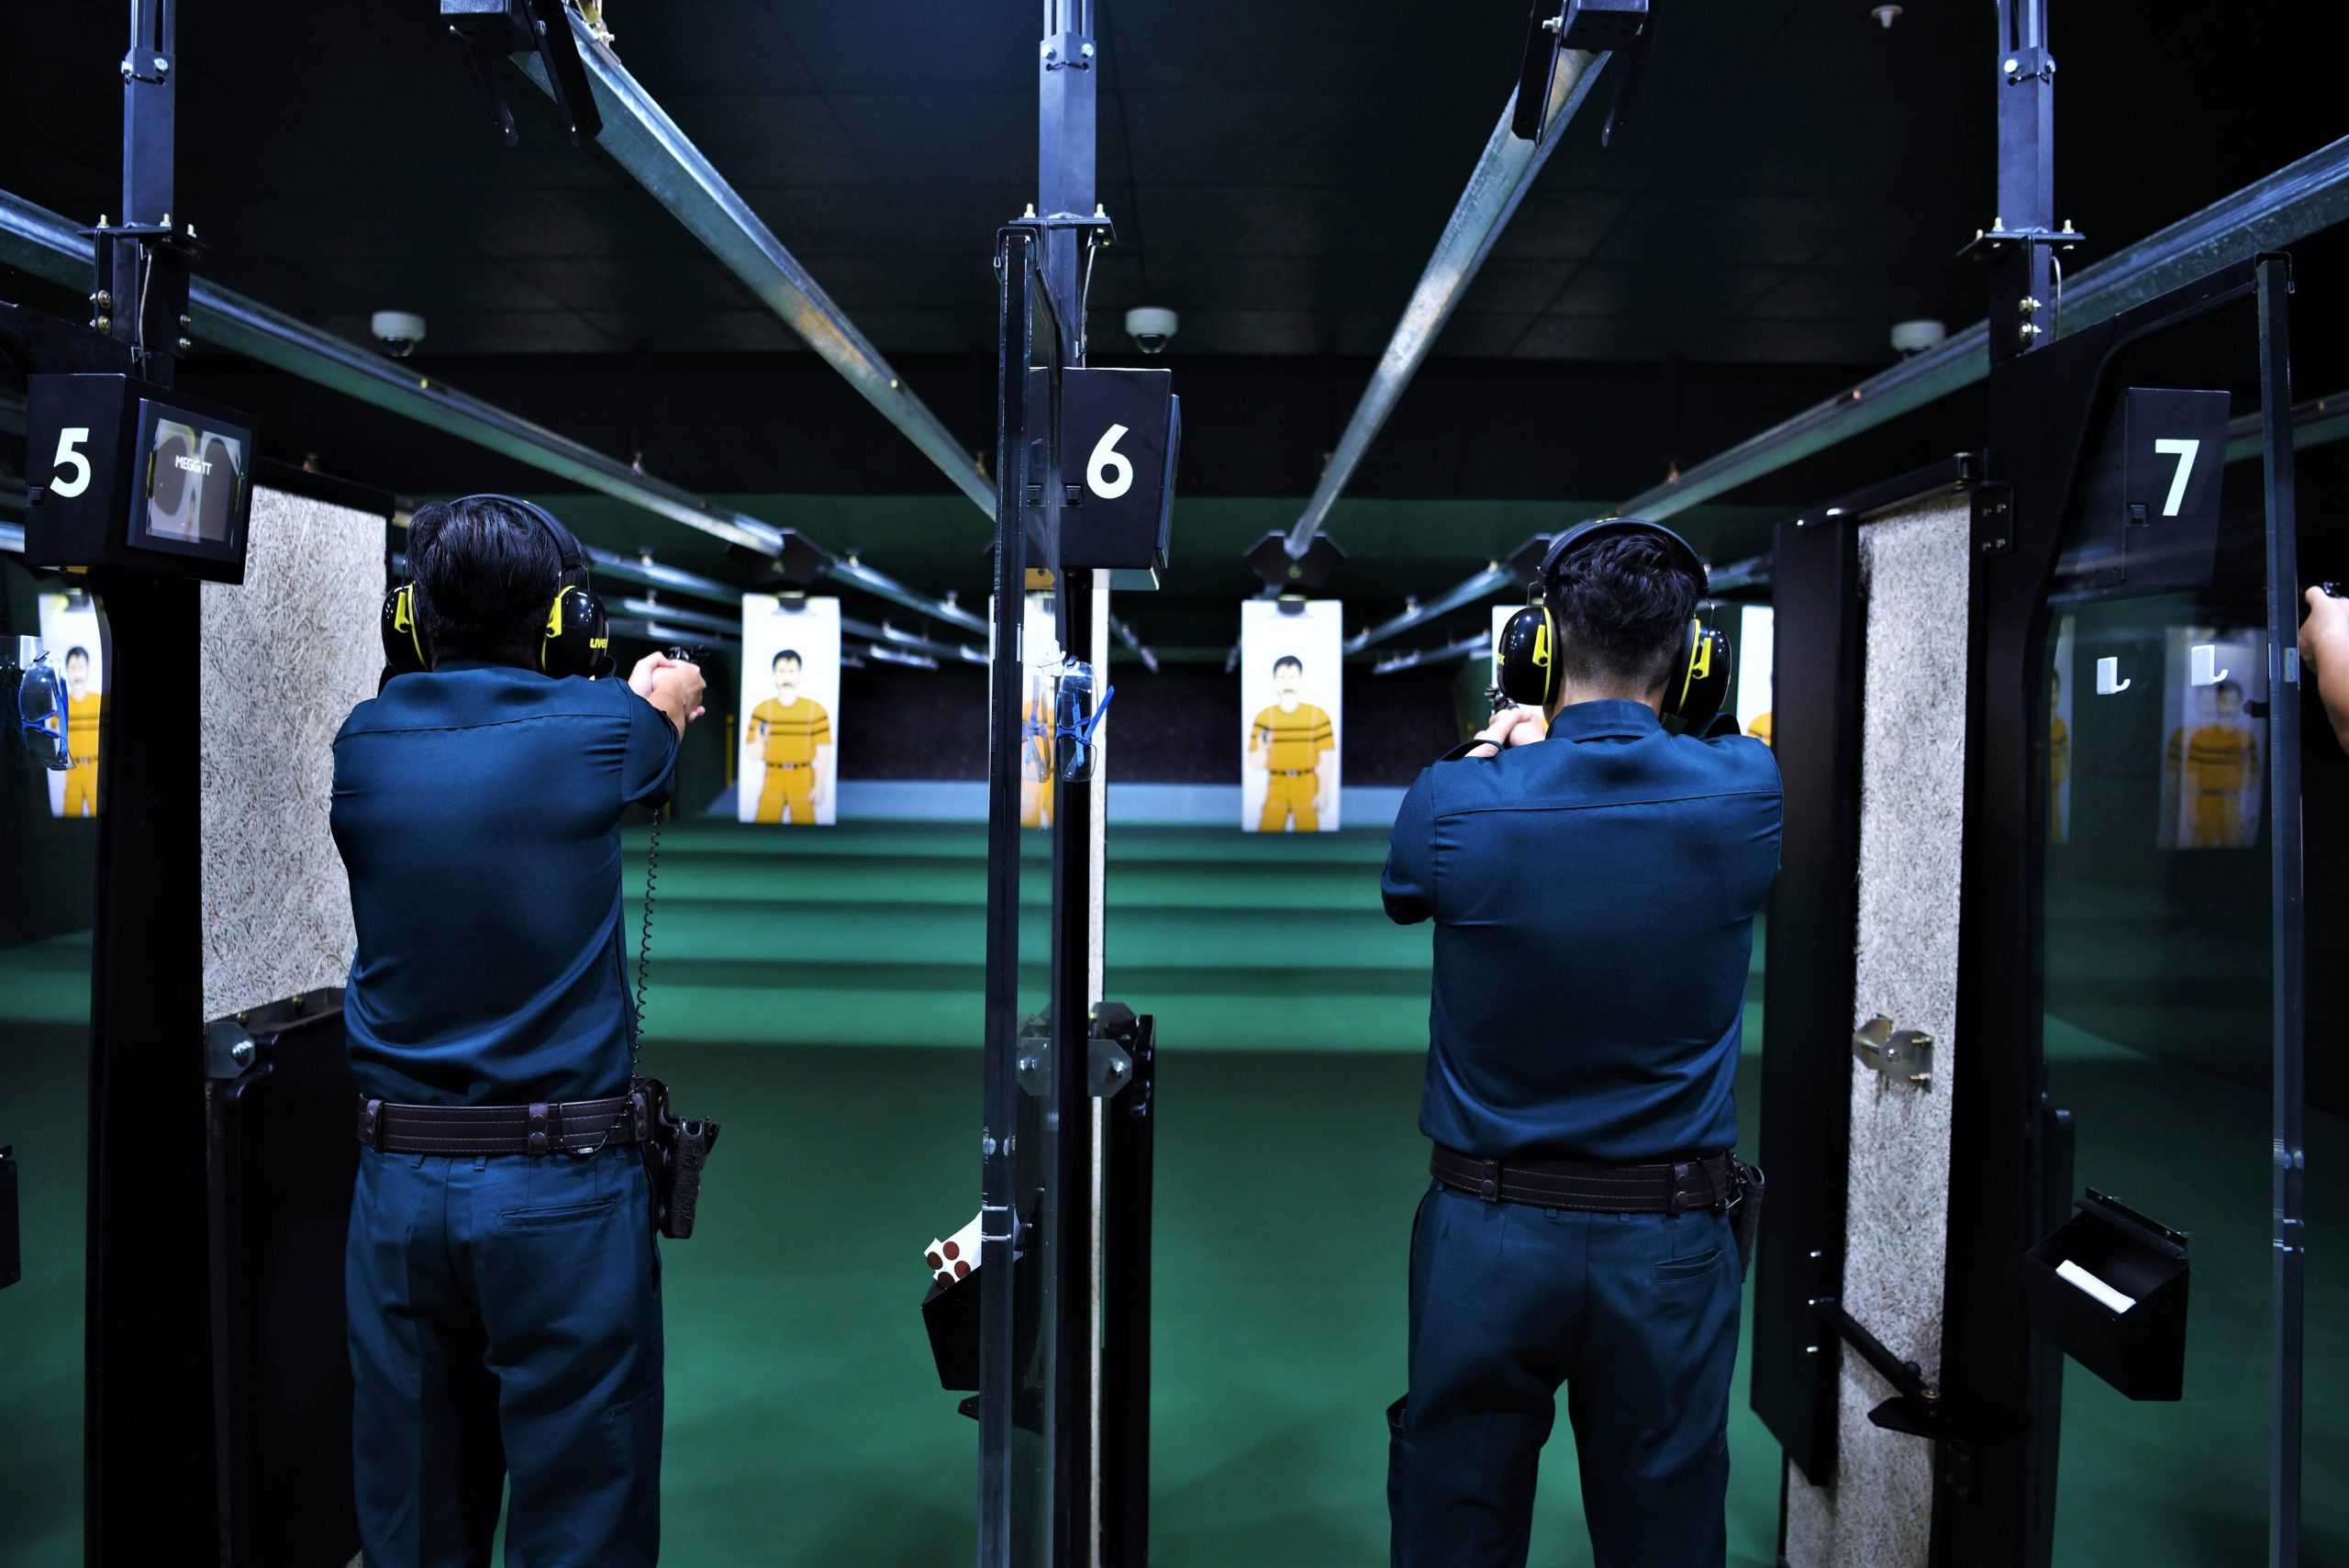 AETOS indoor live firing range